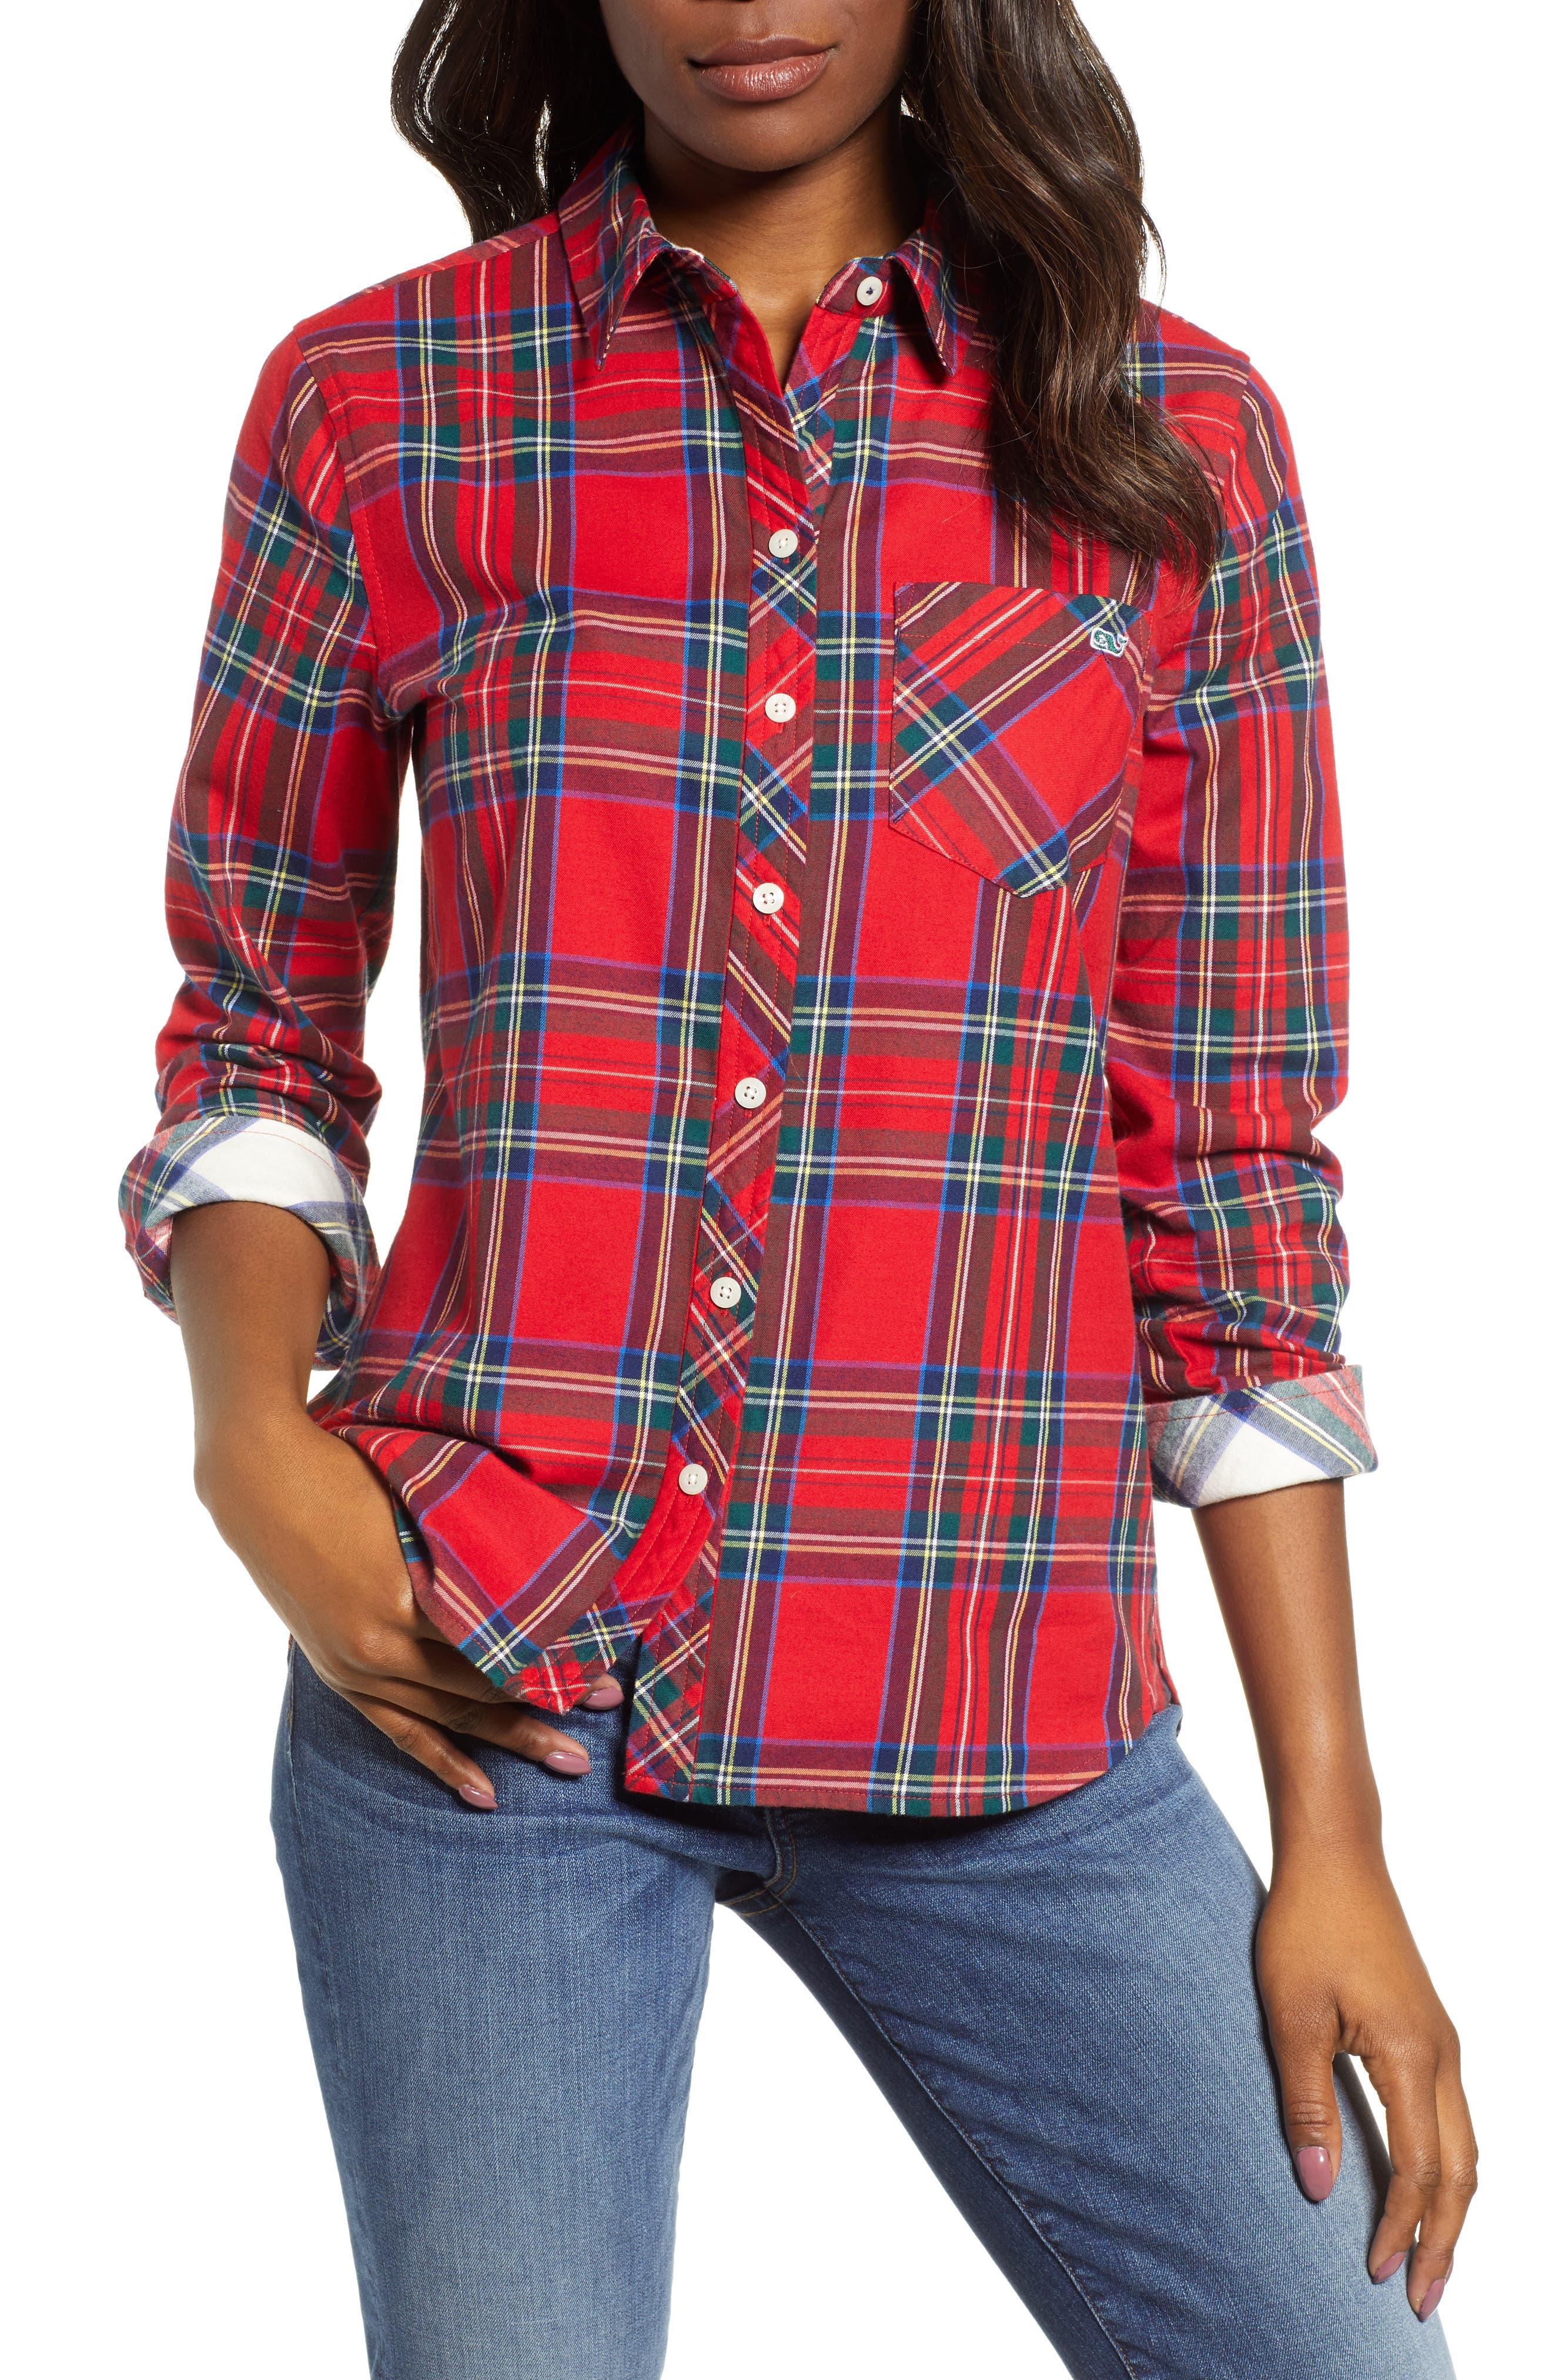 Morgan Jolly Plaid Flannel Shirt,                             Main thumbnail 1, color,                             600